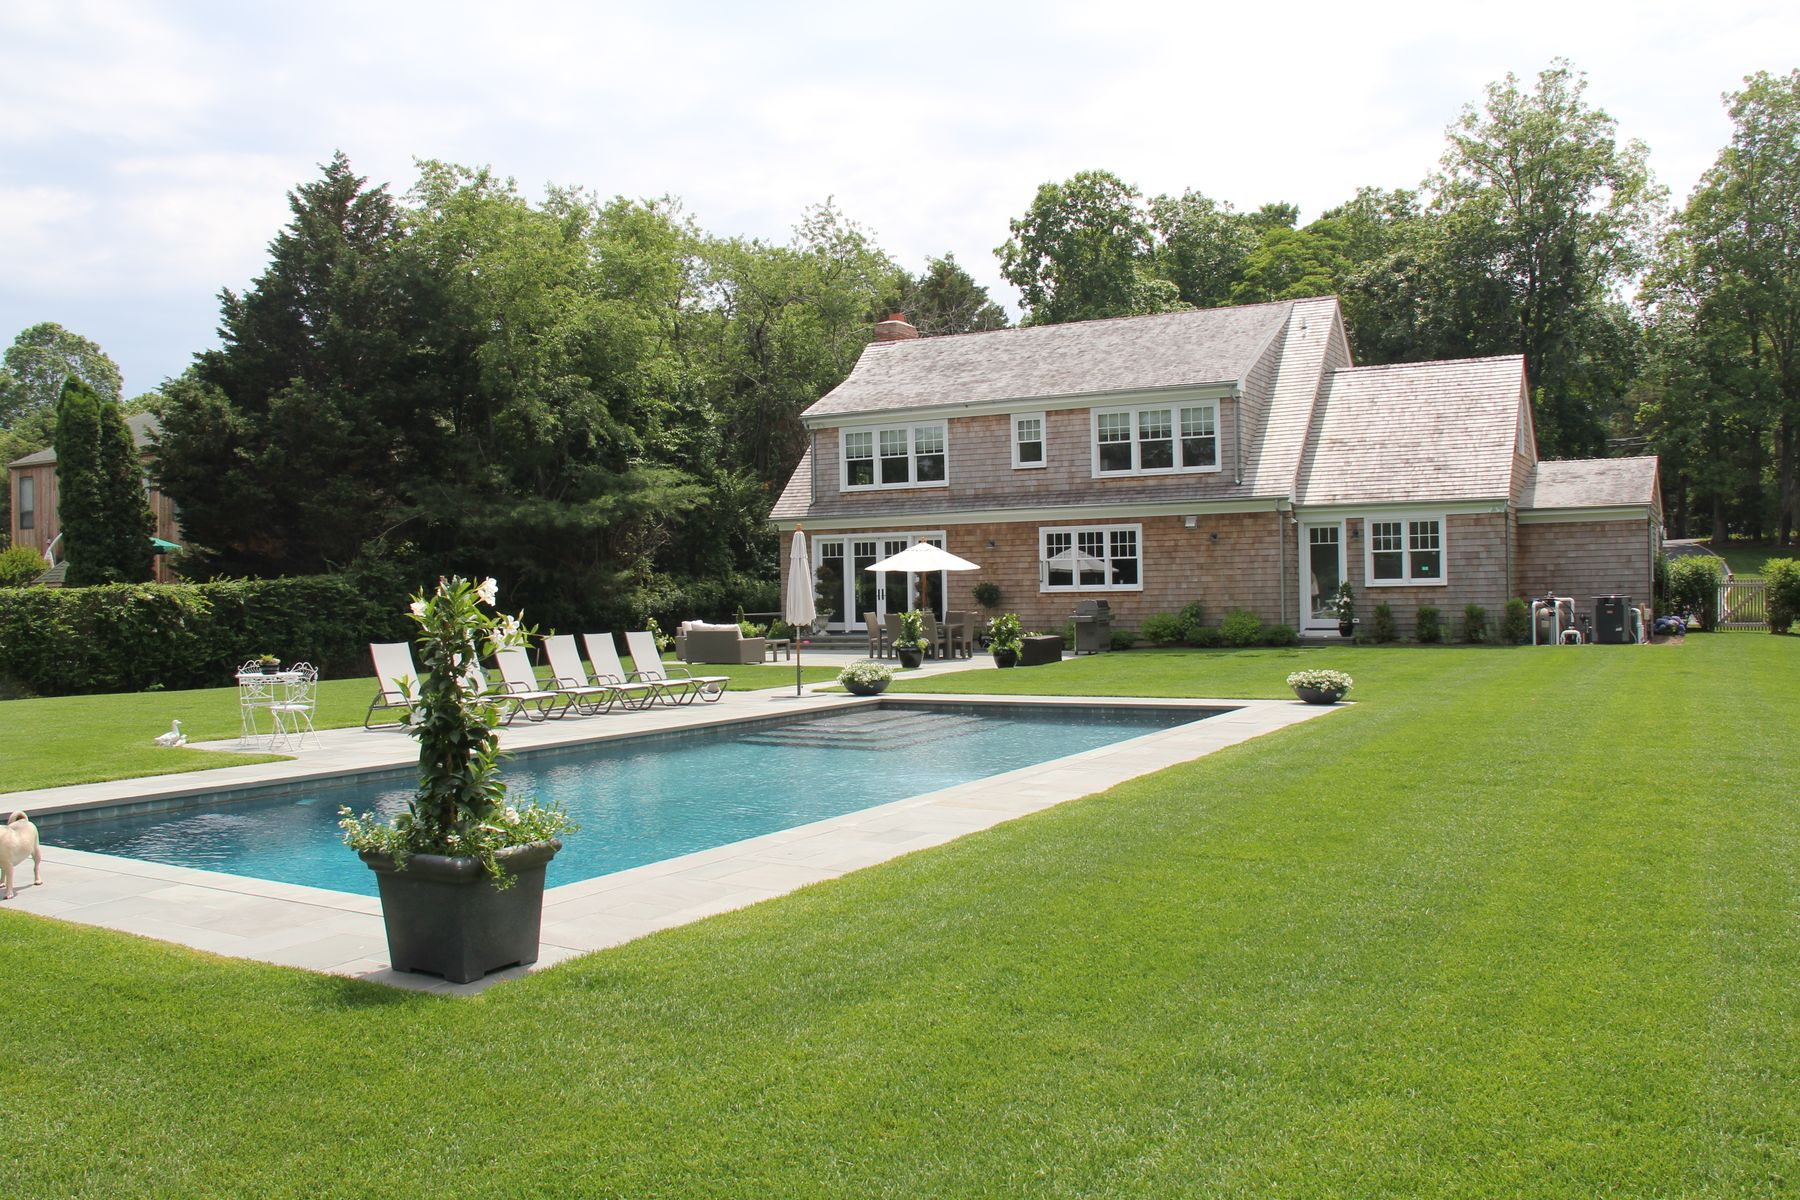 Single Family Home for Rent at Beautiful Amagansett Amagansett, New York 11930 United States